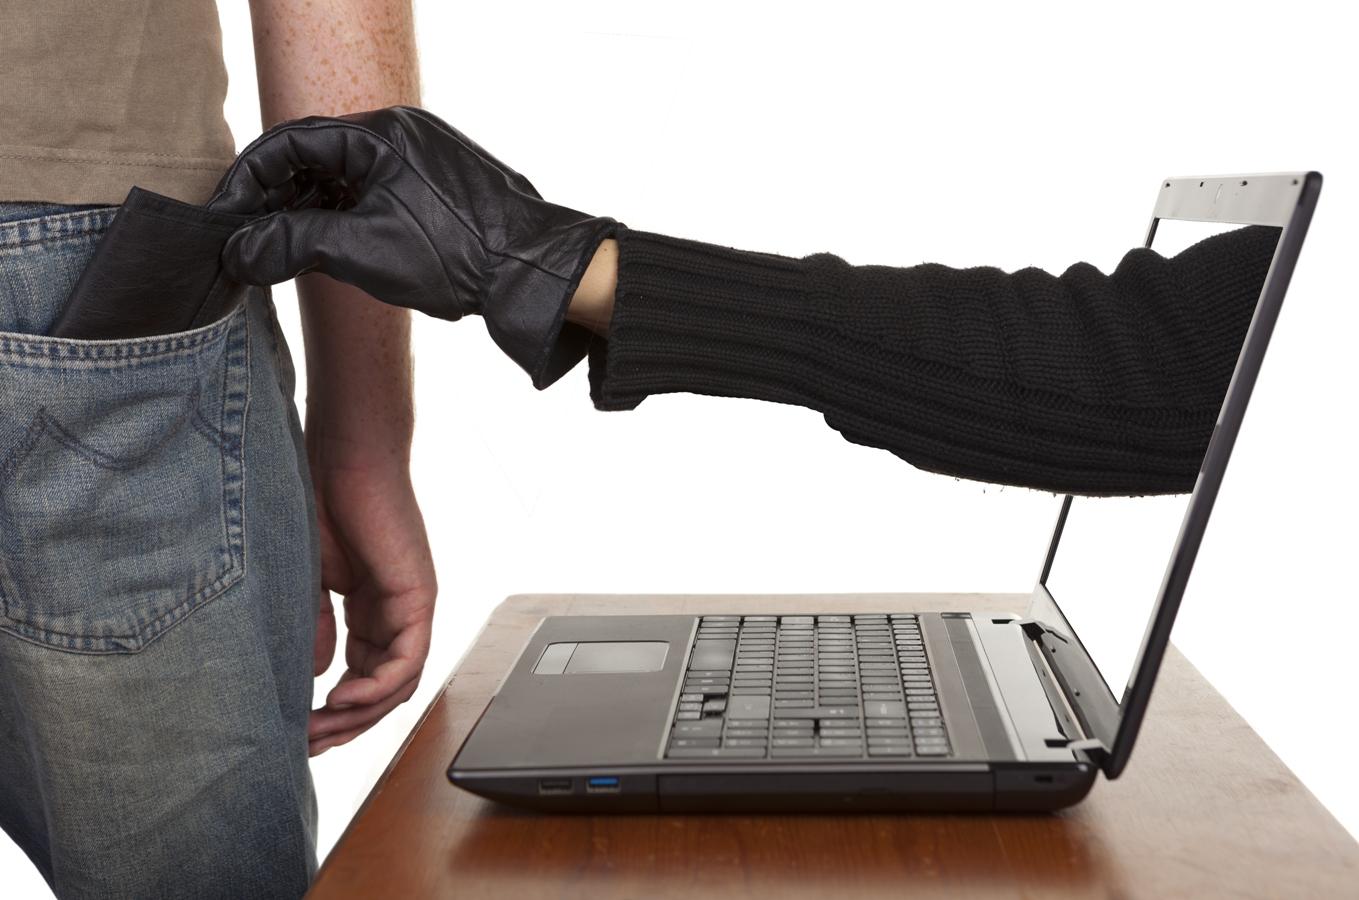 hacker sm.jpg